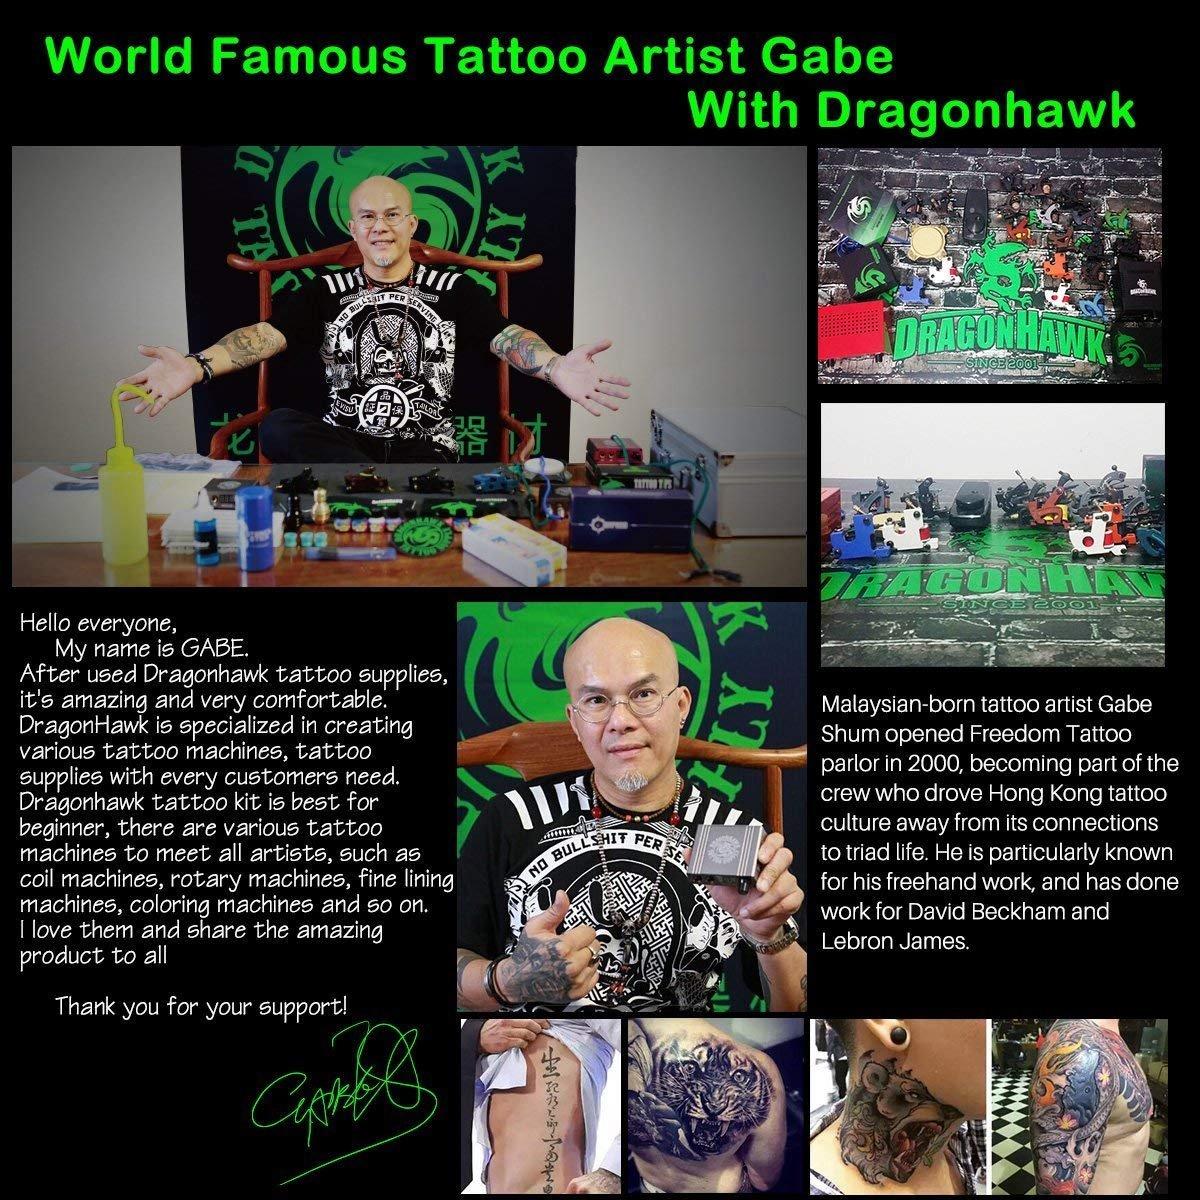 Dragonhawk Complete Tattoo Kit 2 Machine Gun 10 Color Inks Power Supply by Dragon Hawk (Image #8)